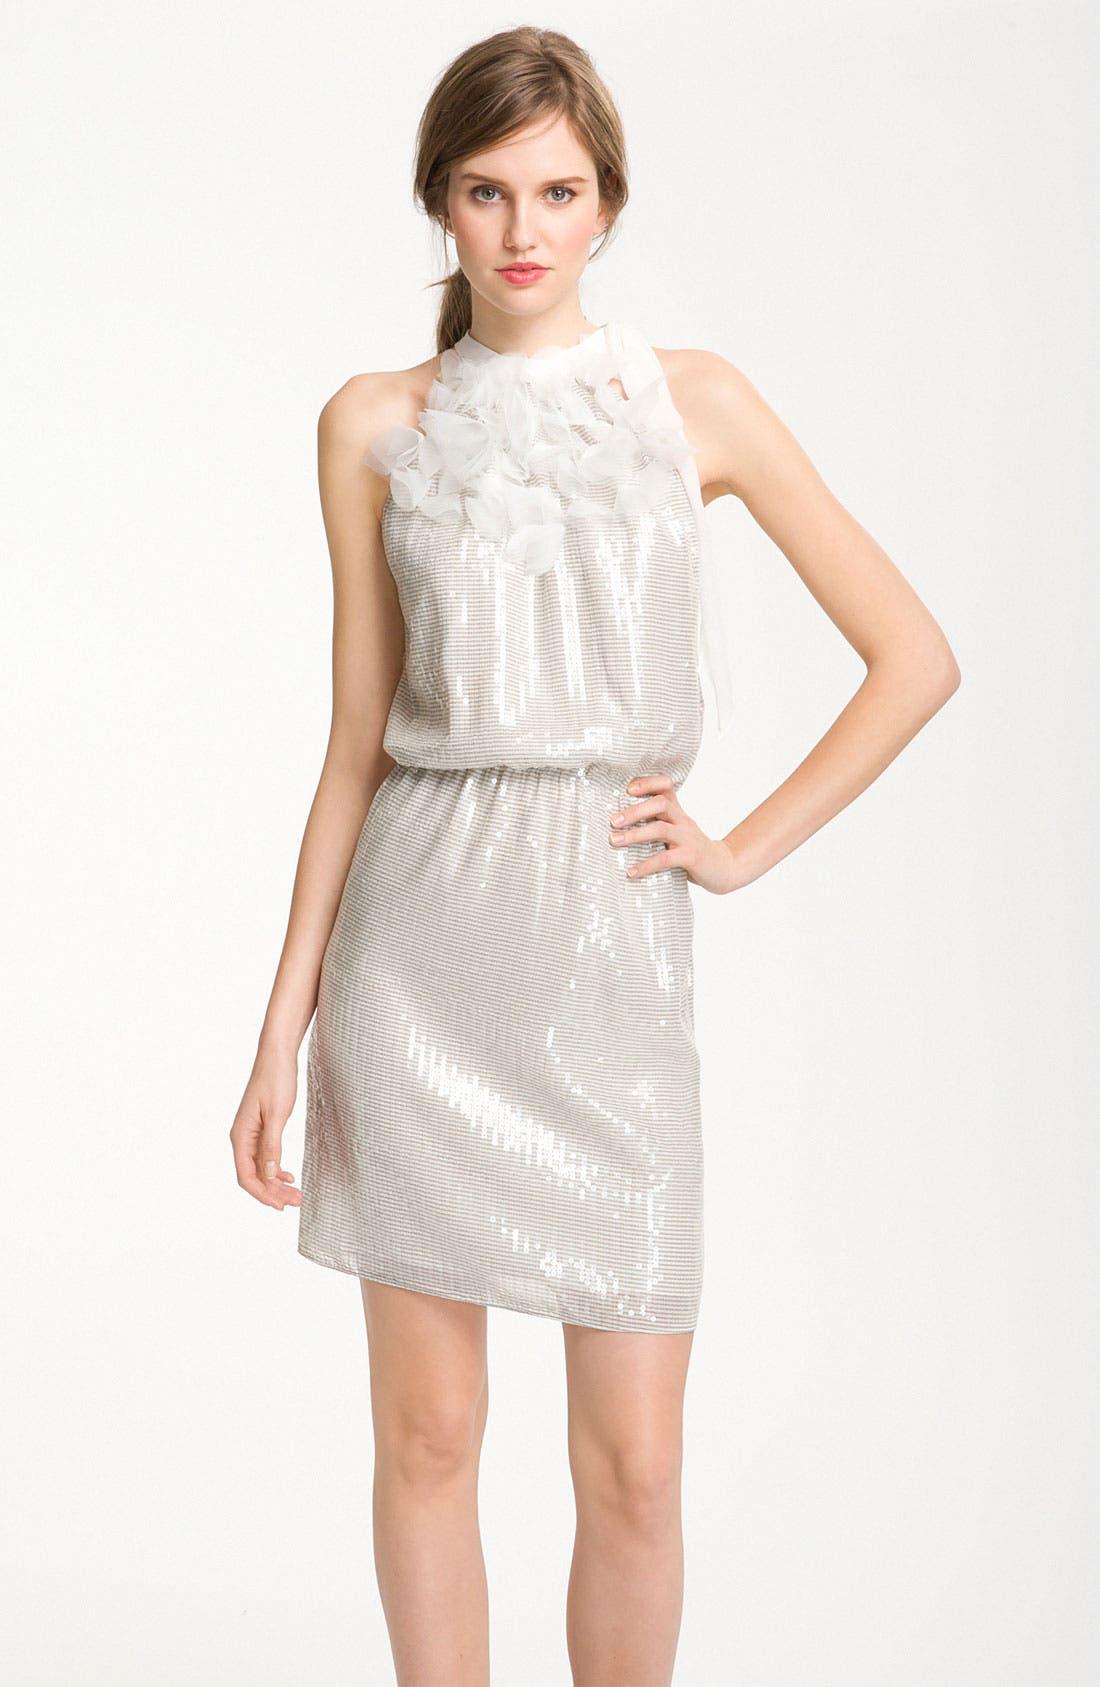 Alternate Image 1 Selected - Kathy Hilton Sequin Blouson Halter Dress